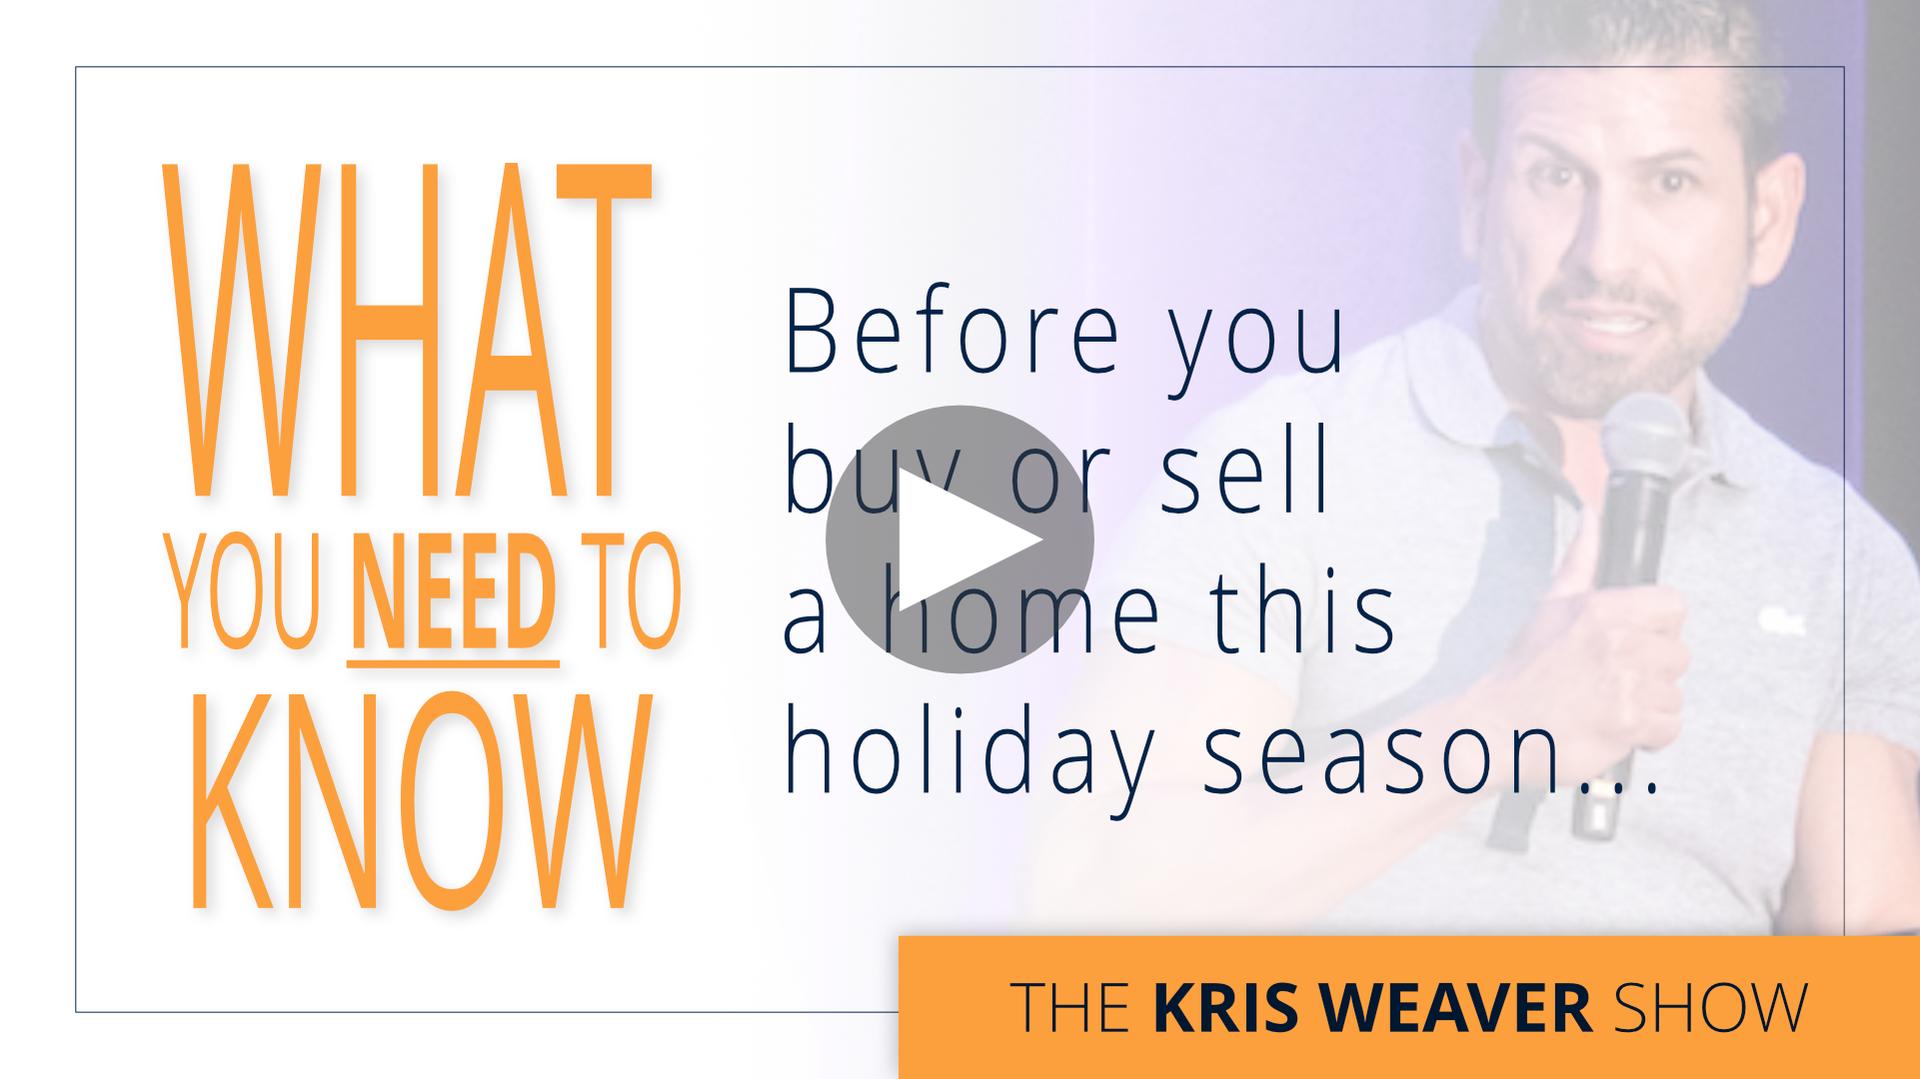 Watch The Kris Weaver Show Now!